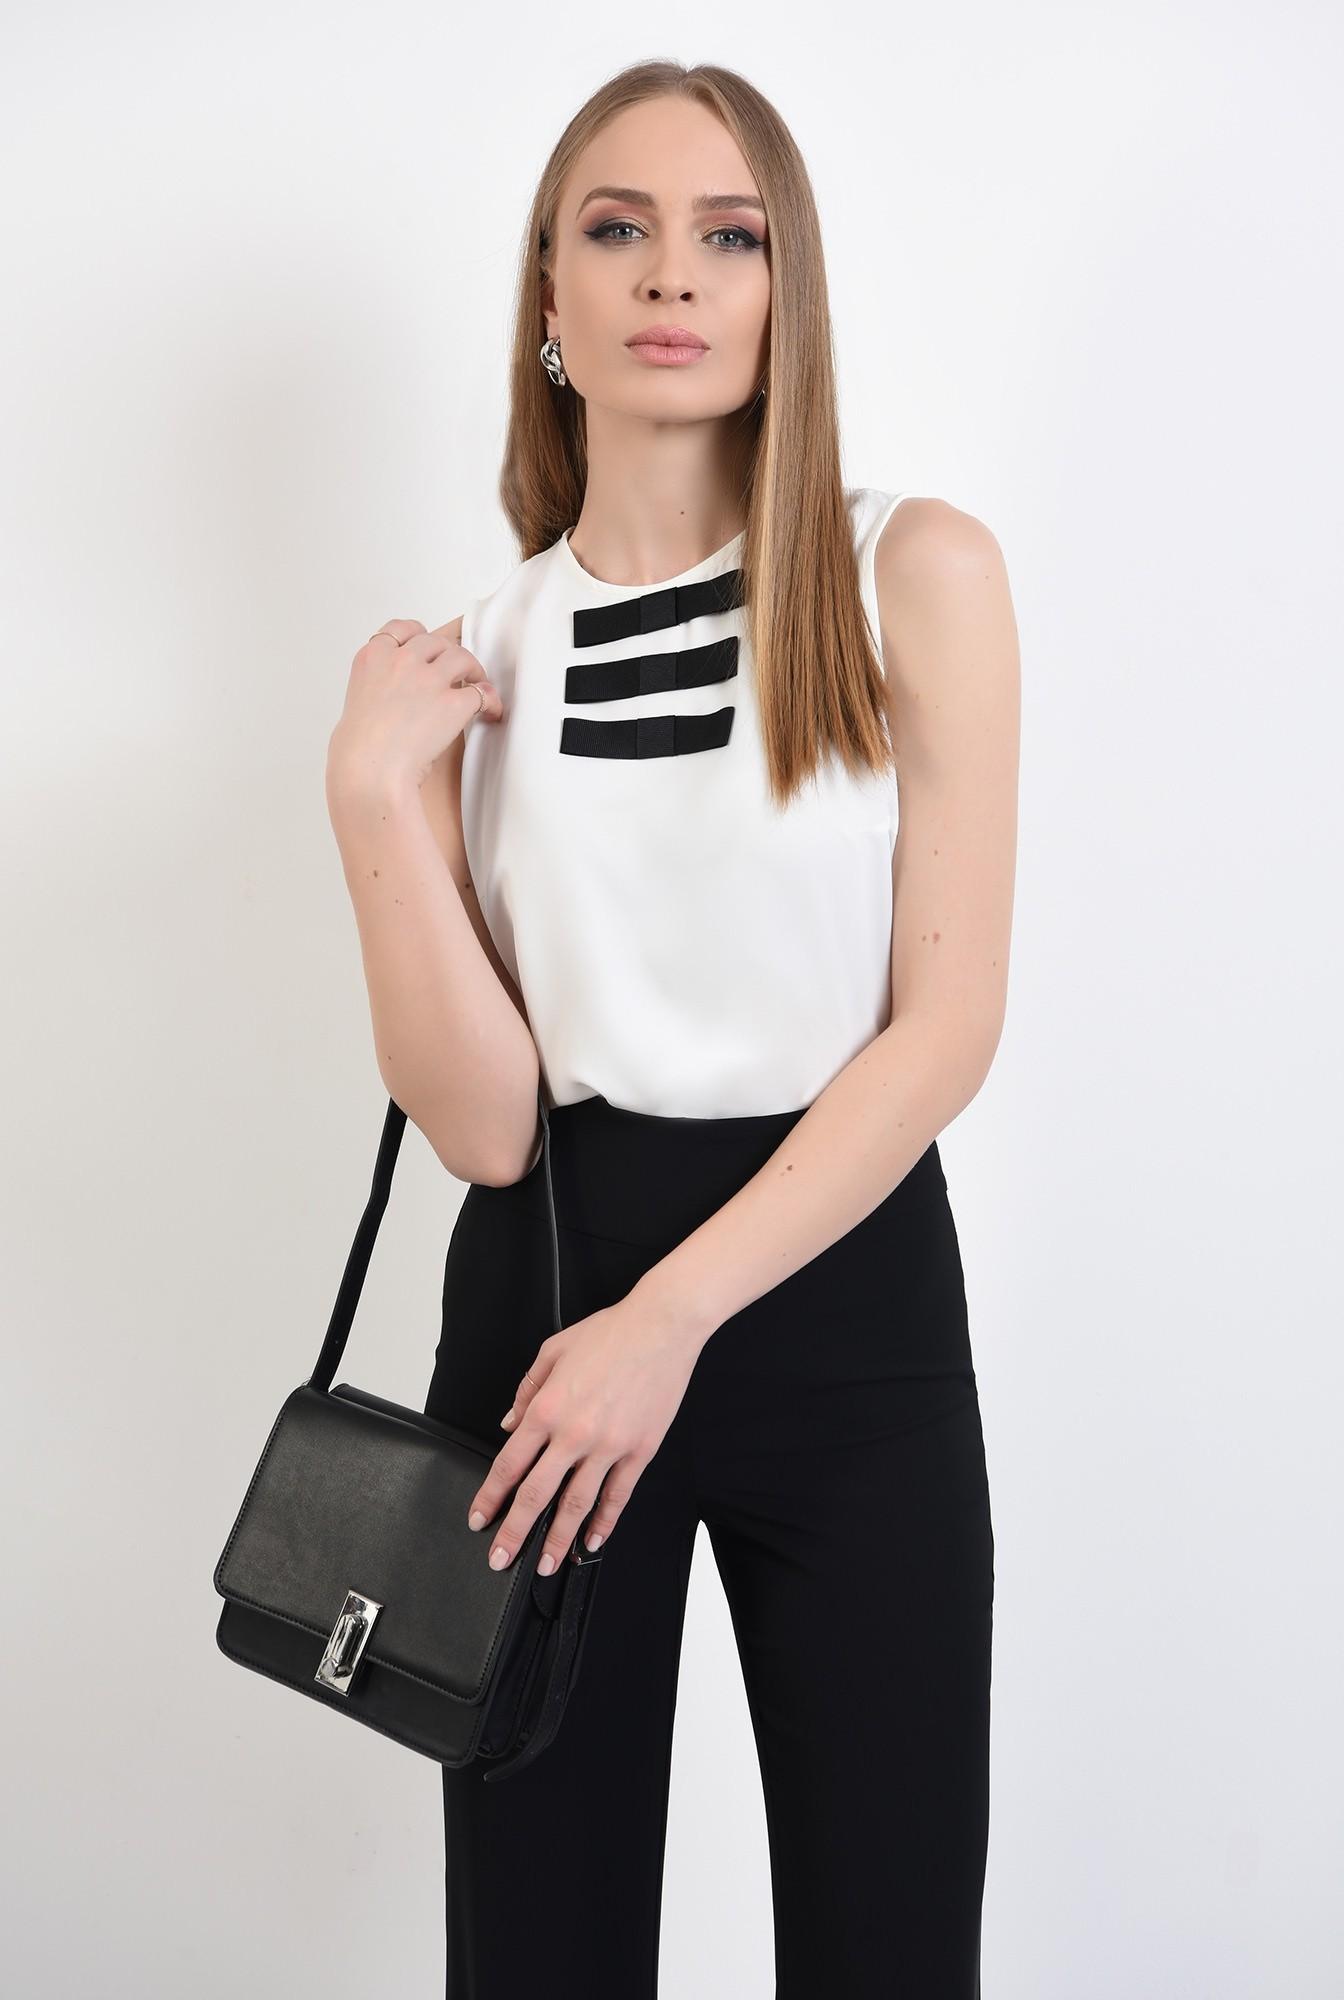 0 -  bluza office, fara maneci, cu funde in contrast, bluza de zi